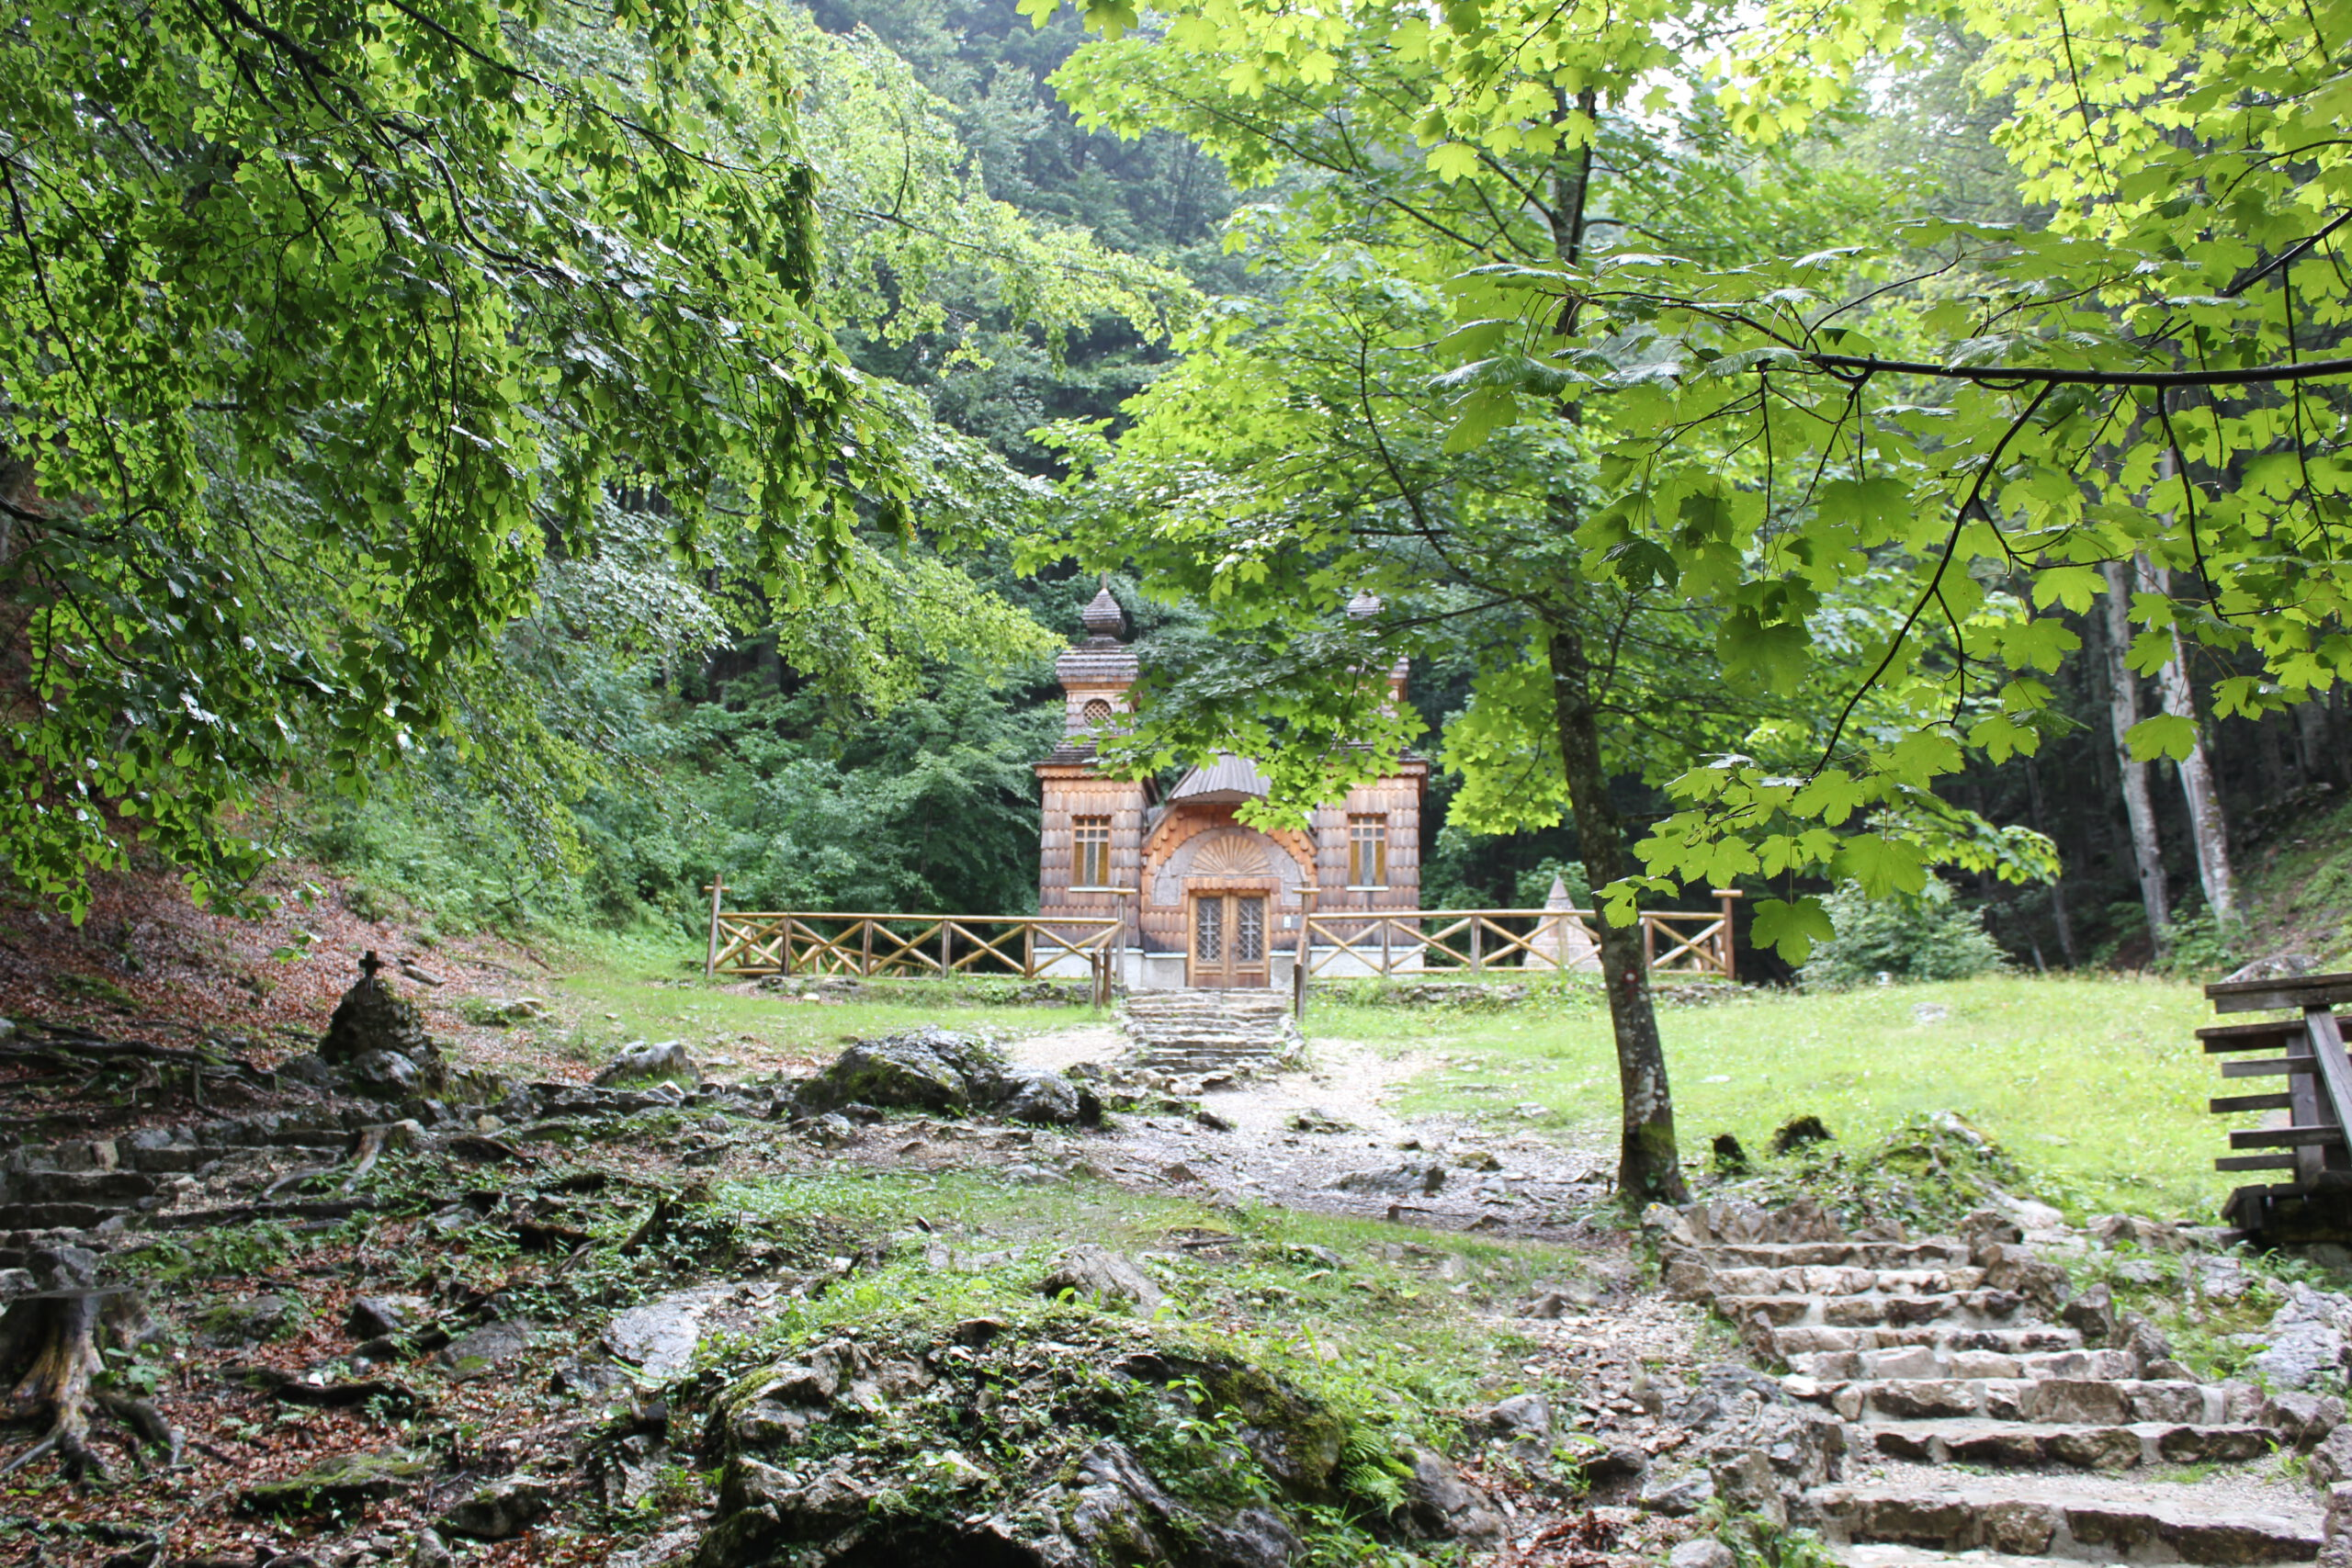 Reizen in Slovenië - Reisgelukjes - Russische Kapel